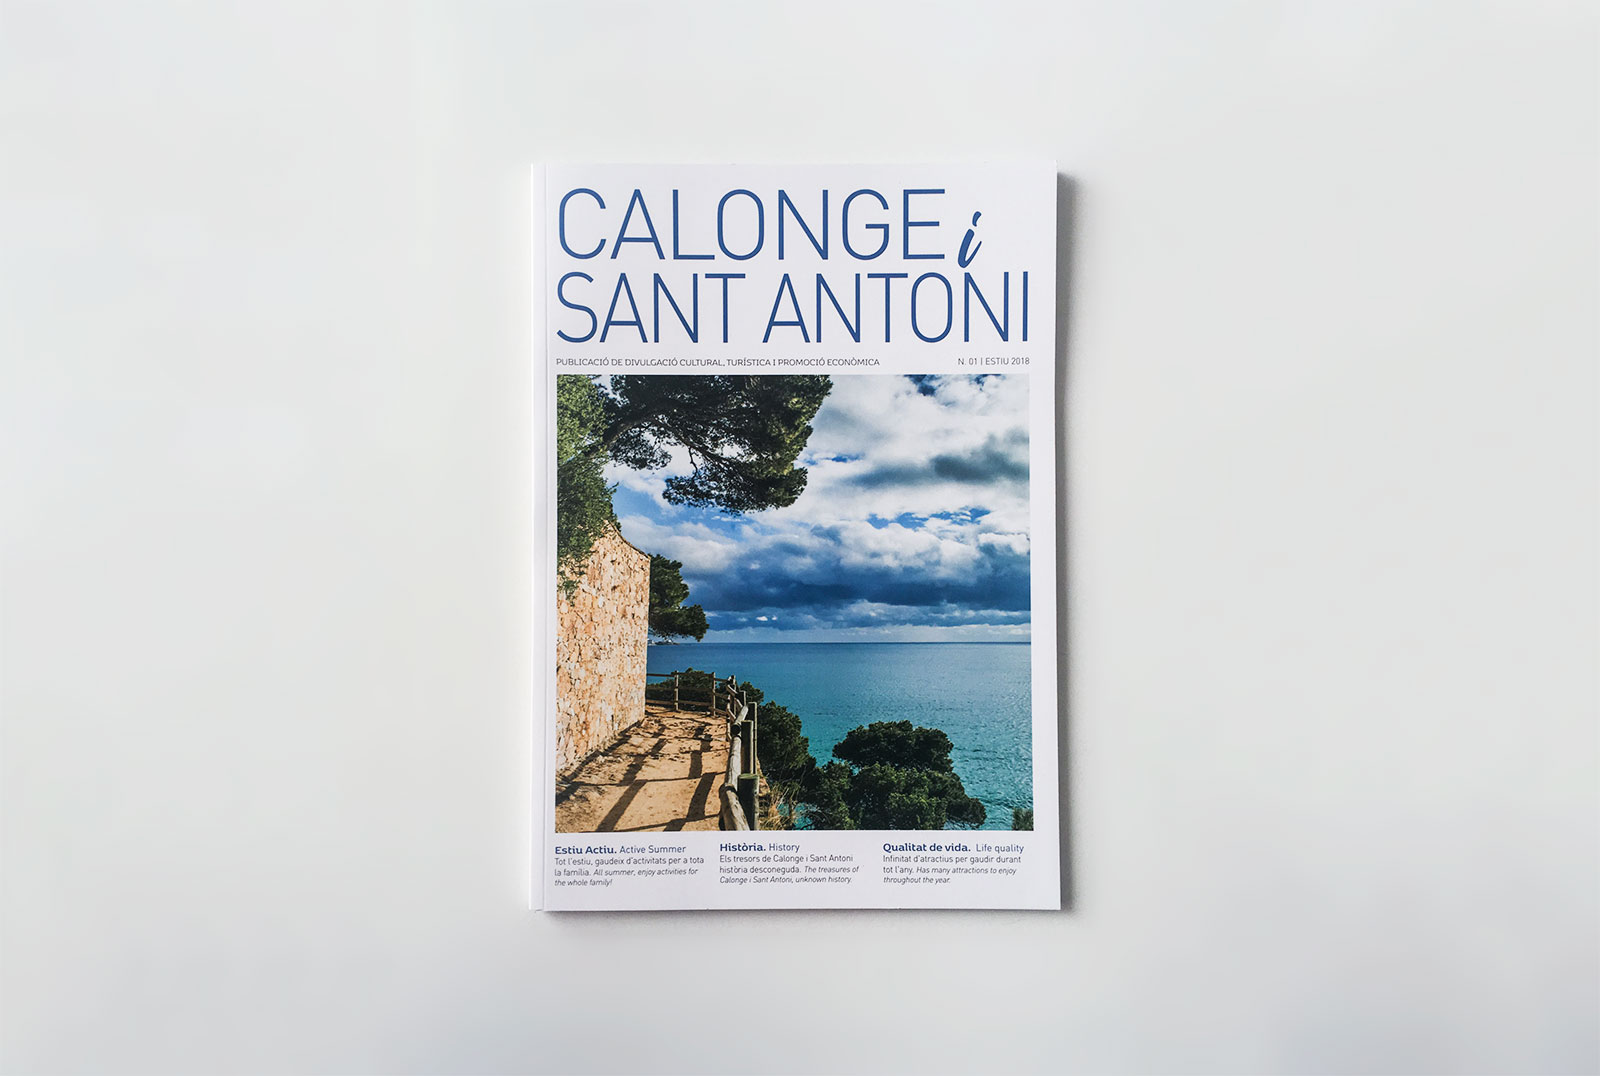 ¡Os presentamos la nueva revista de Calonge i Sant Antoni!